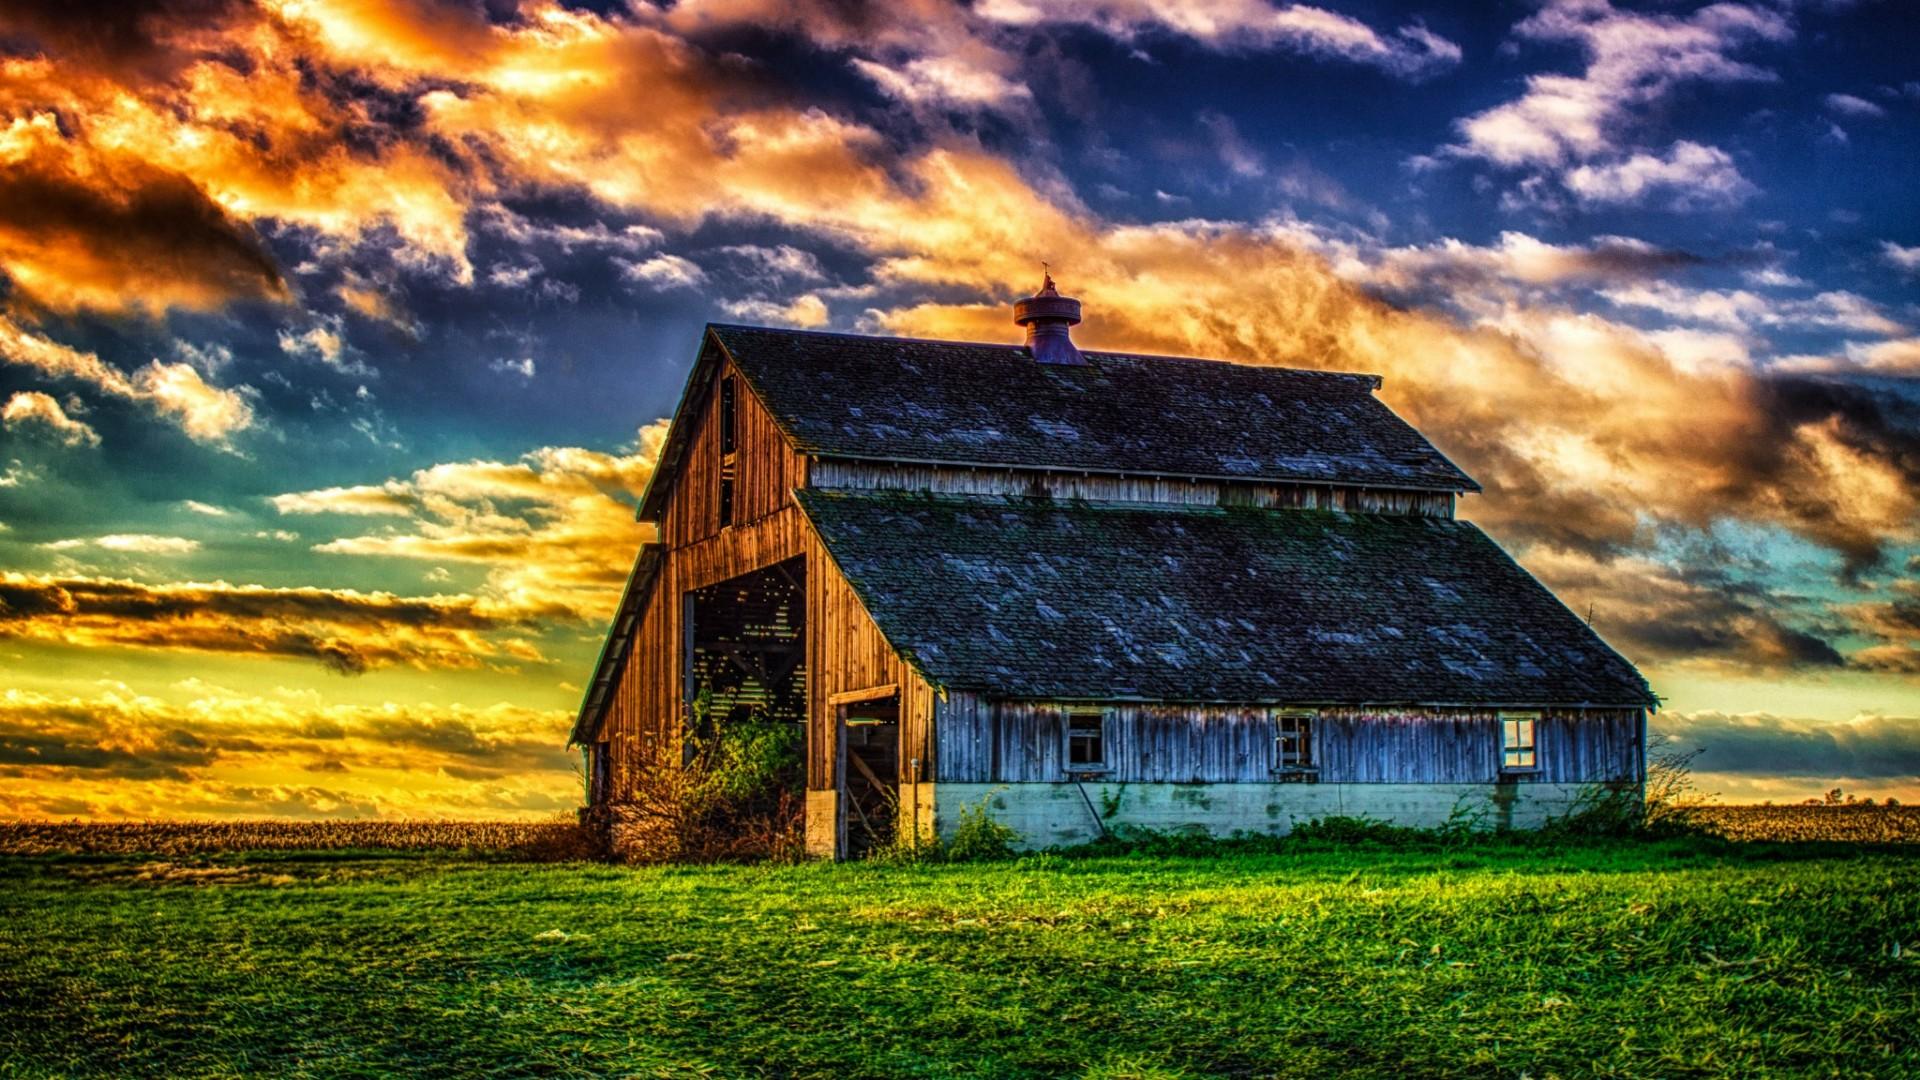 Abandoned Old Barn In The Field Wallpaper | Wallpaper Studio 10 ...